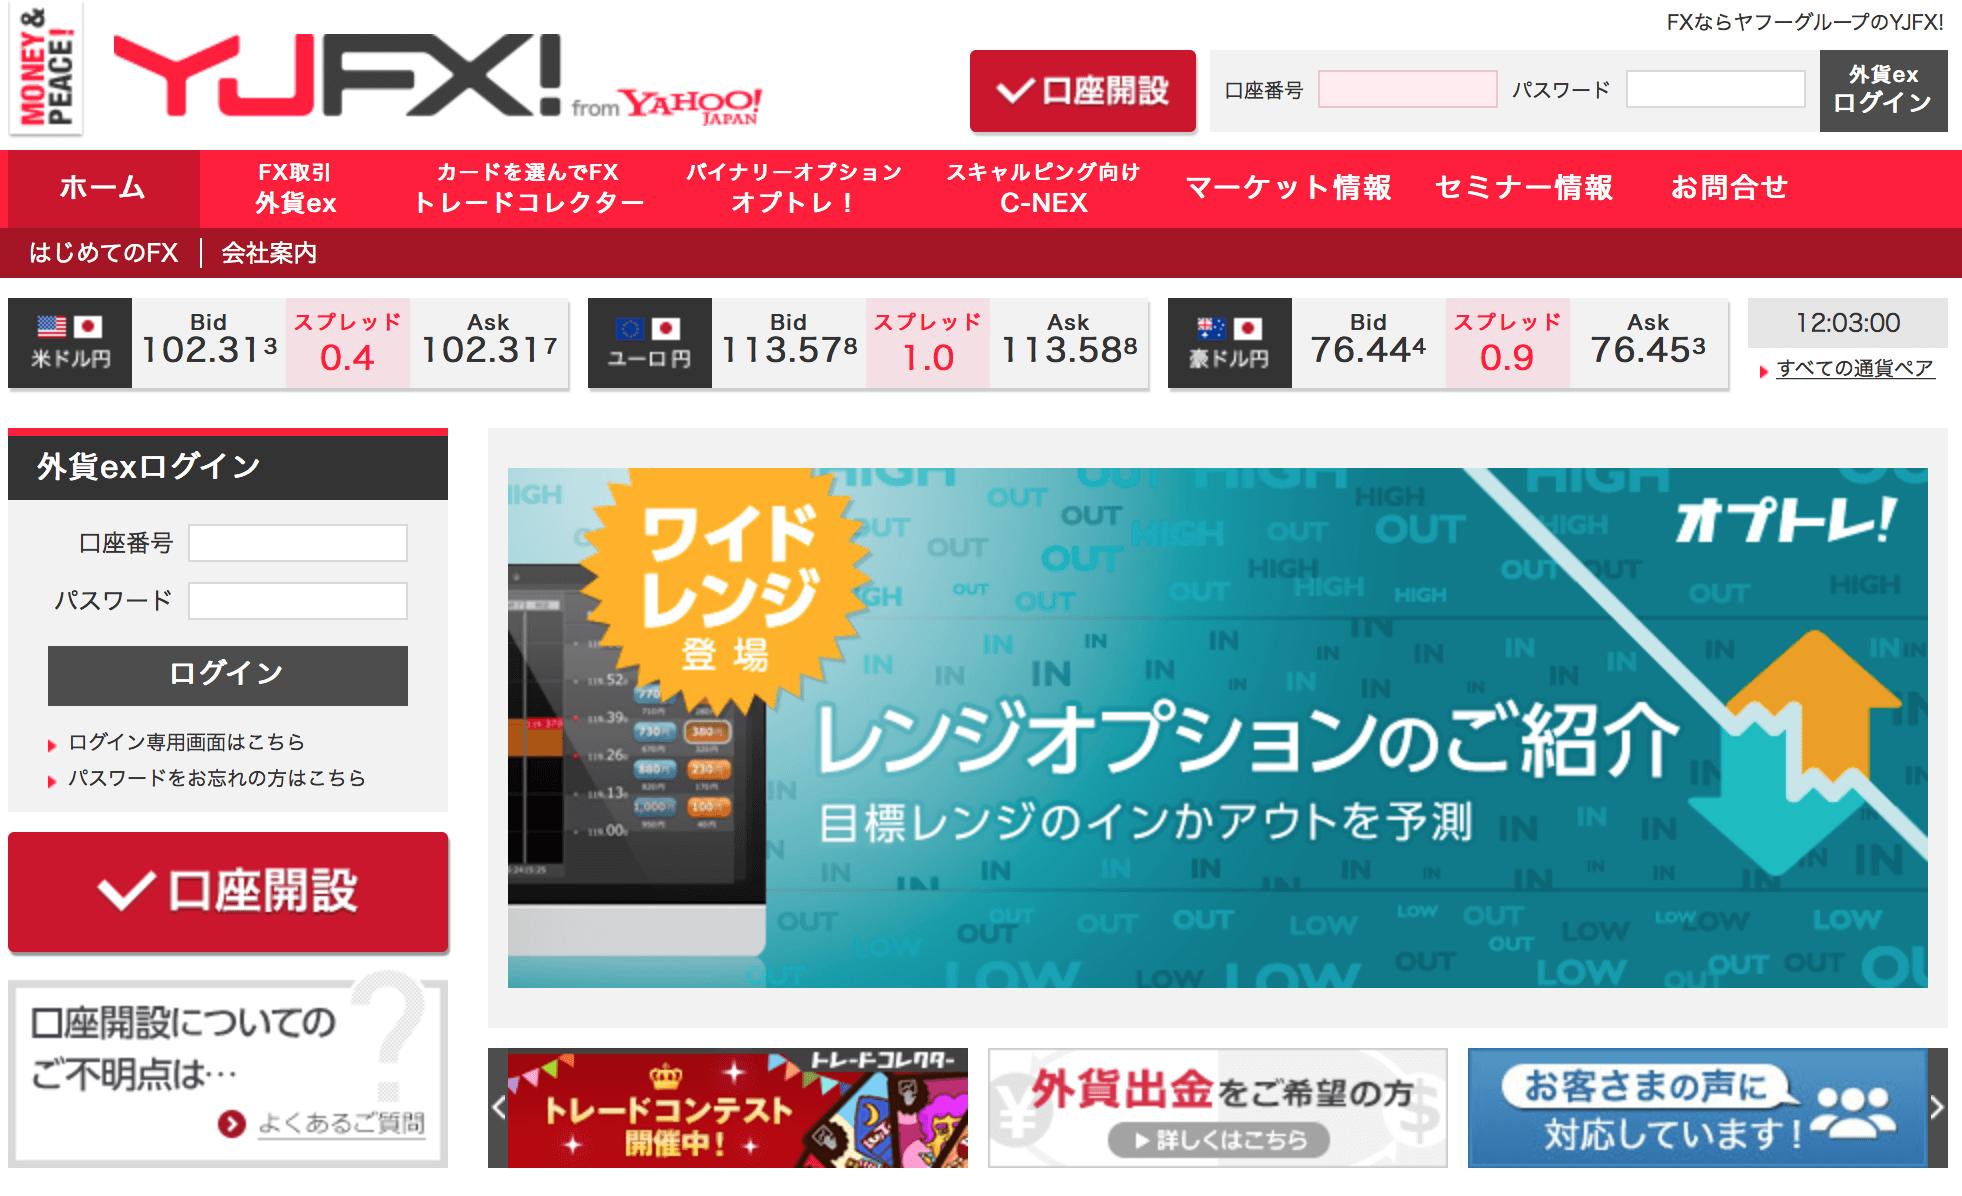 YJFX!の公式ページ